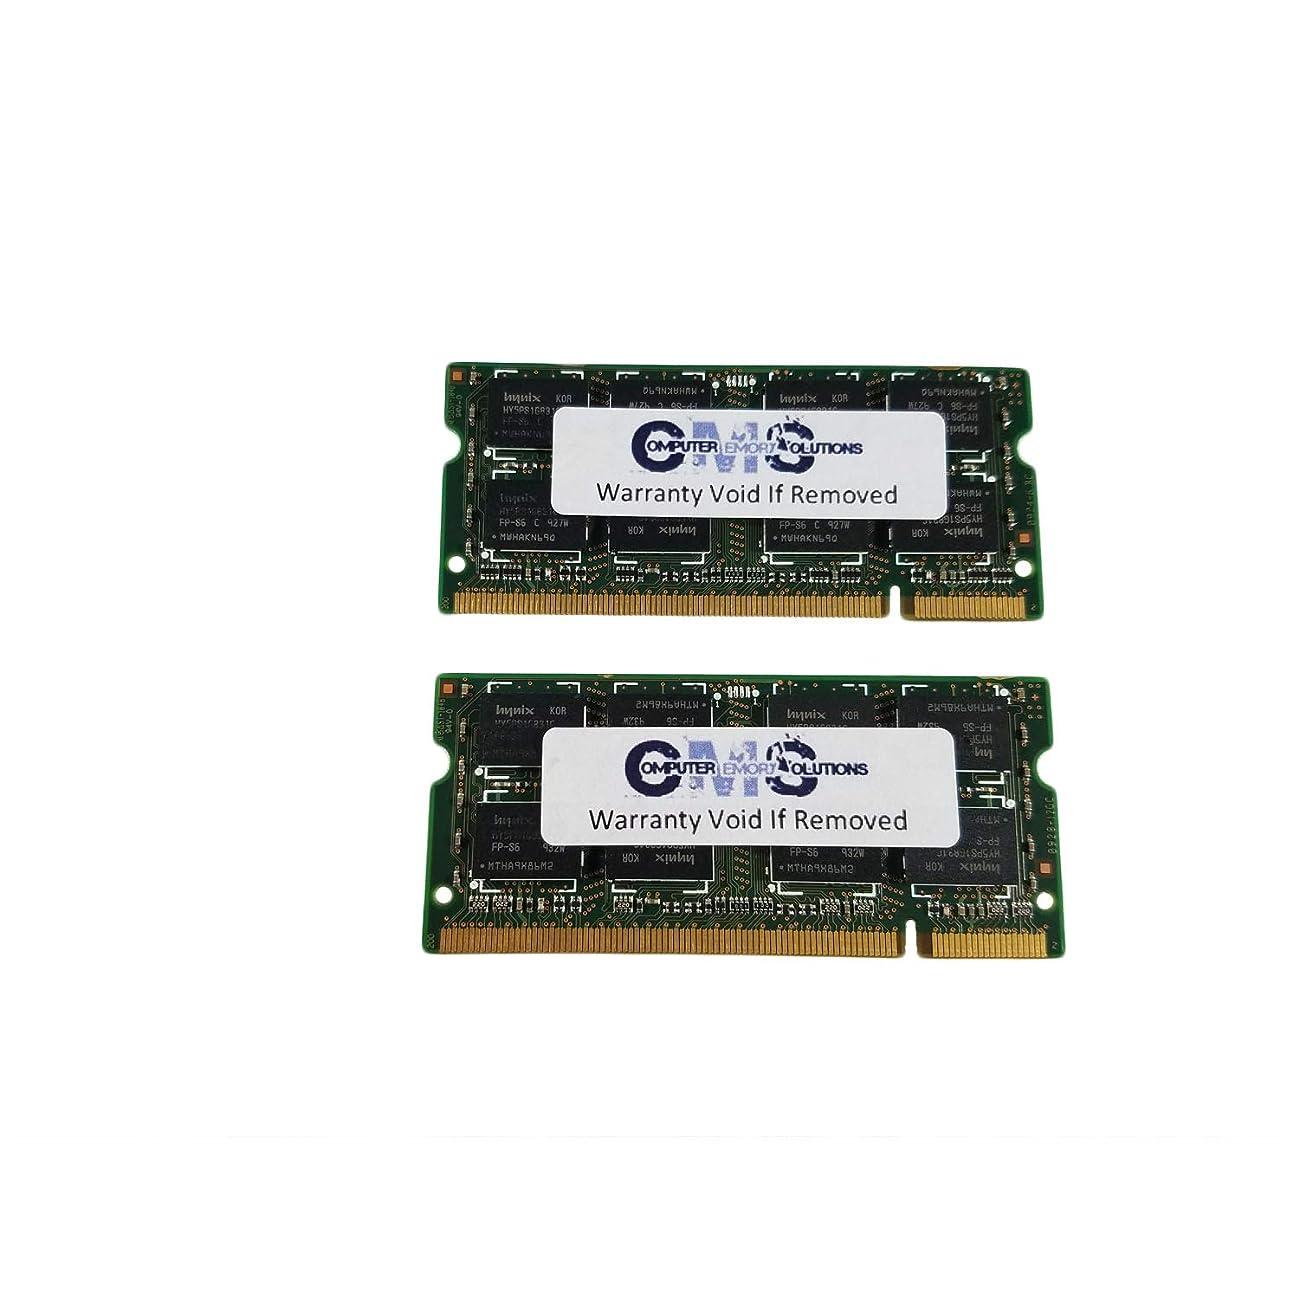 4Gb 2X2Gb Memory Ram Compatible with Acer Aspire One Nav60, Kav50, Kav60, Nav50, Nav60 Net By CMS A37